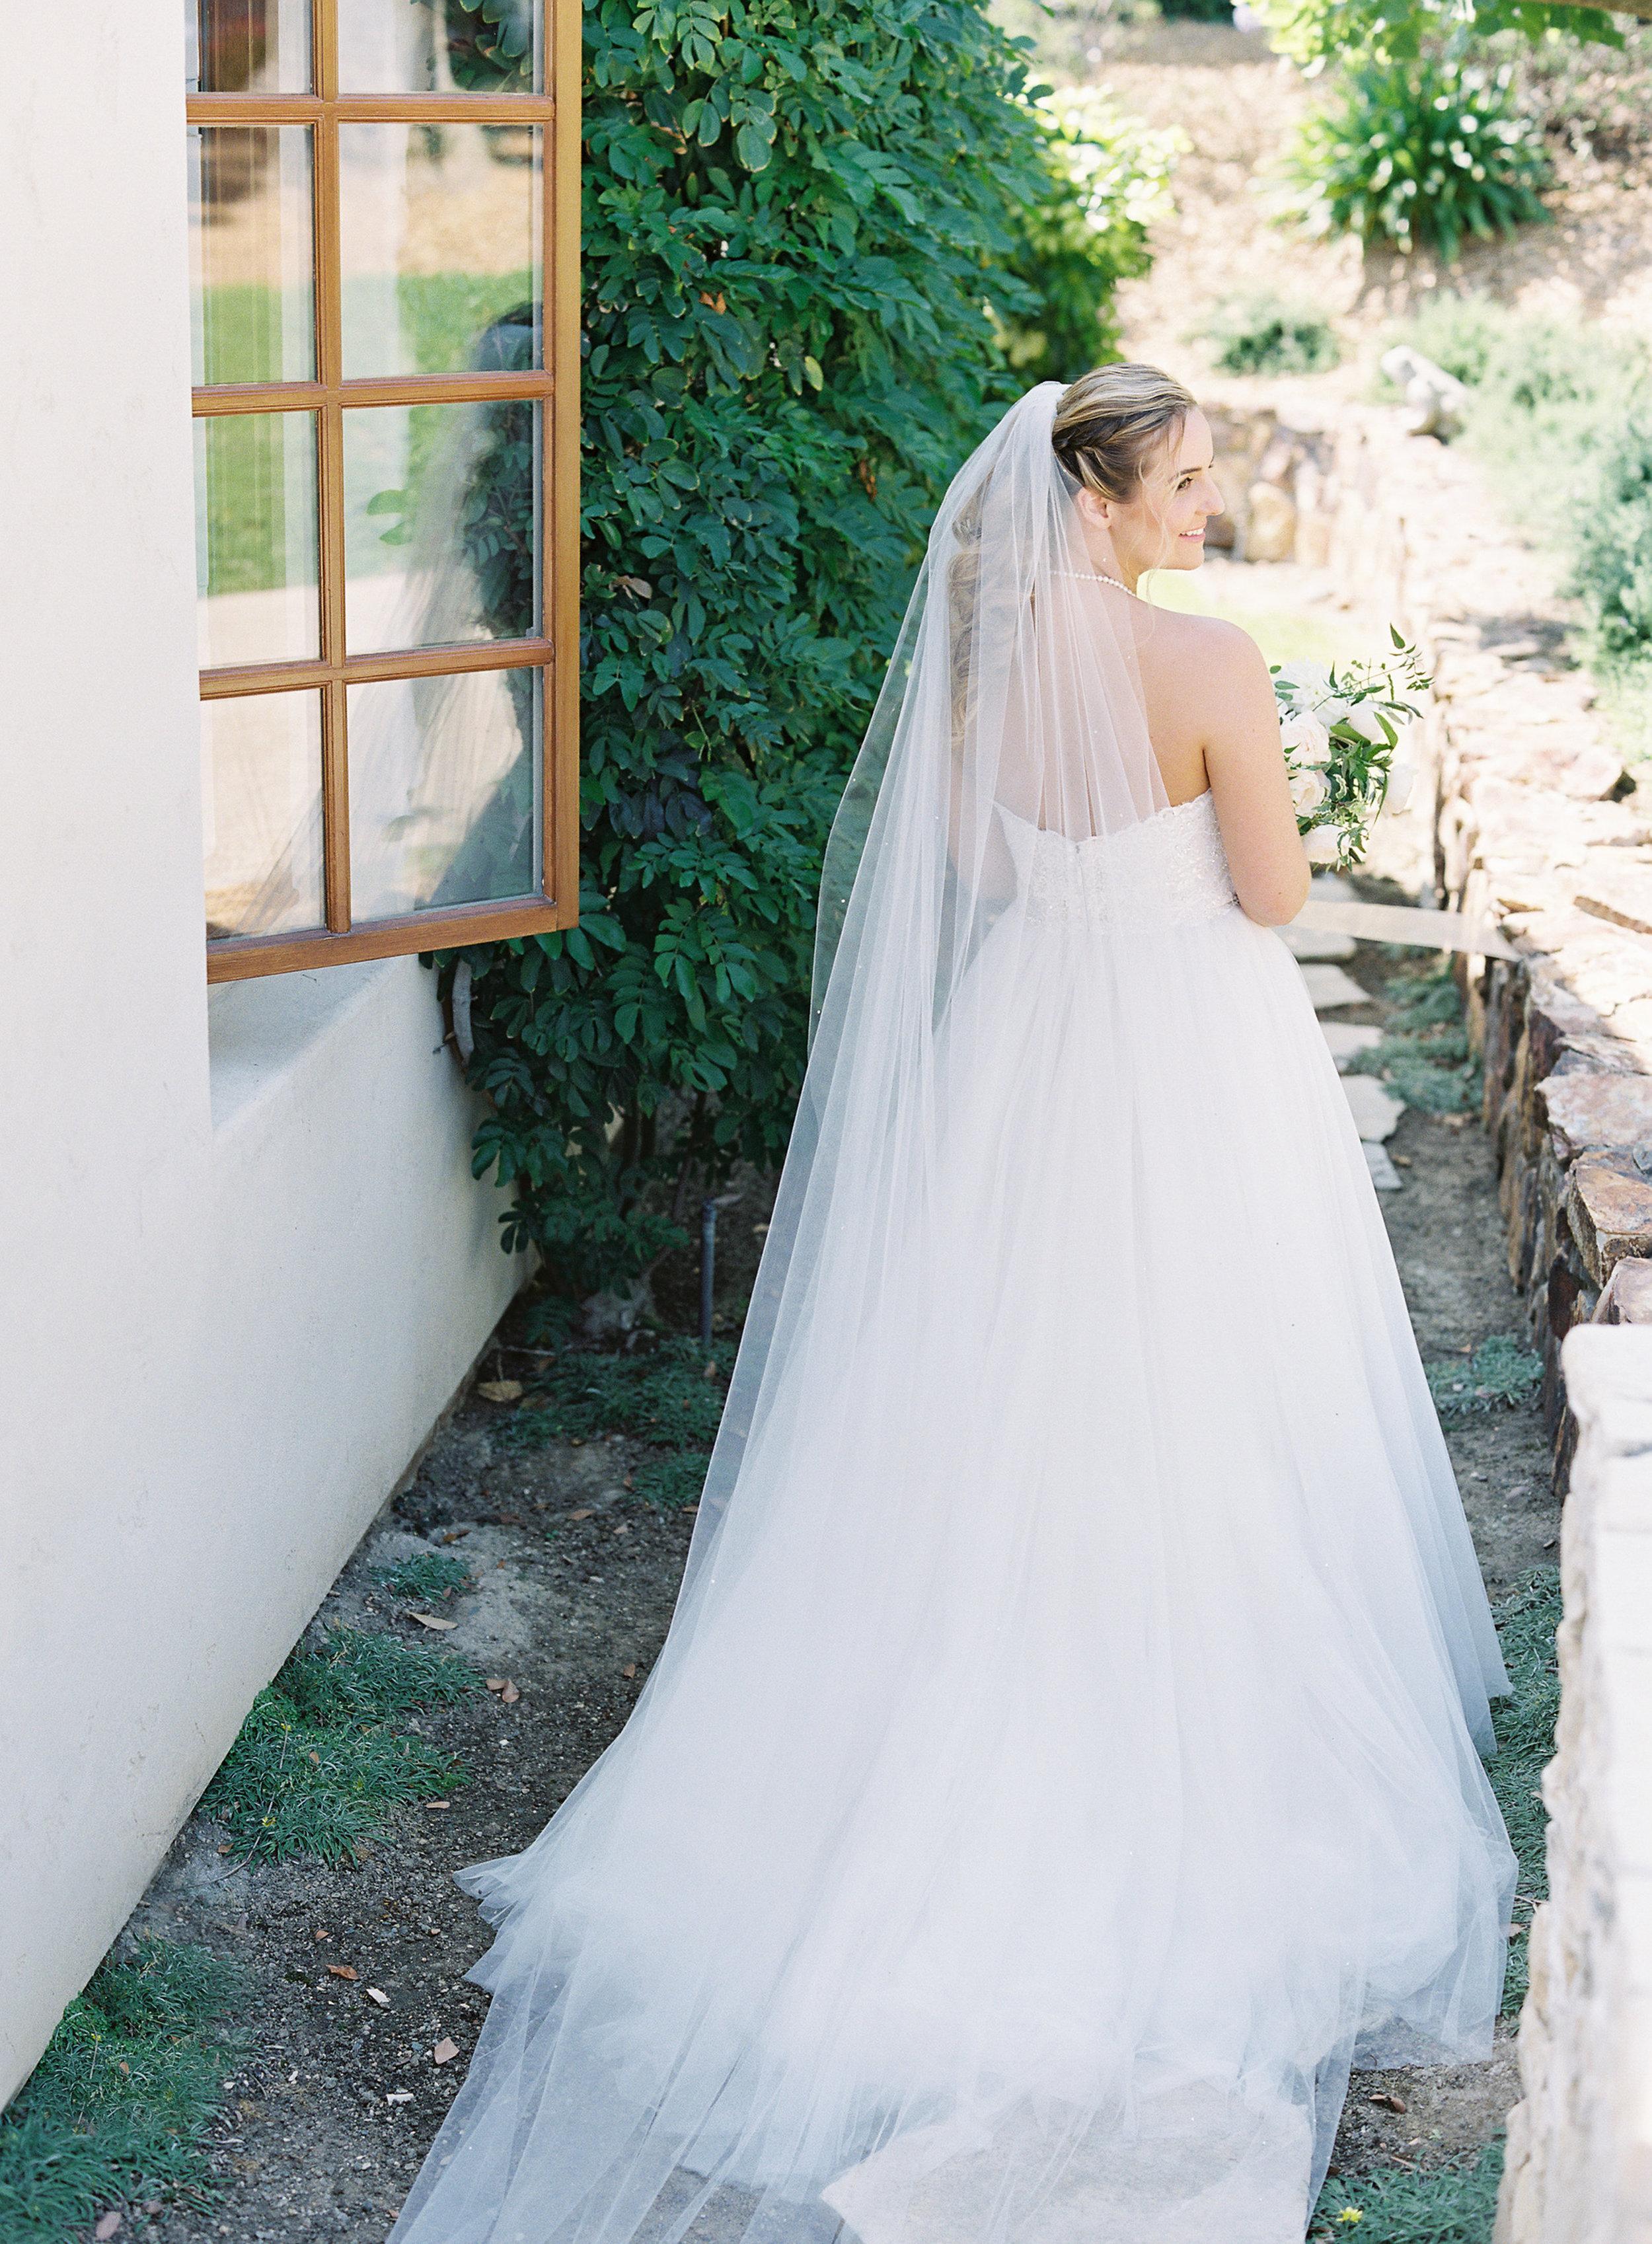 Braden-Hannah-Married-163.jpg